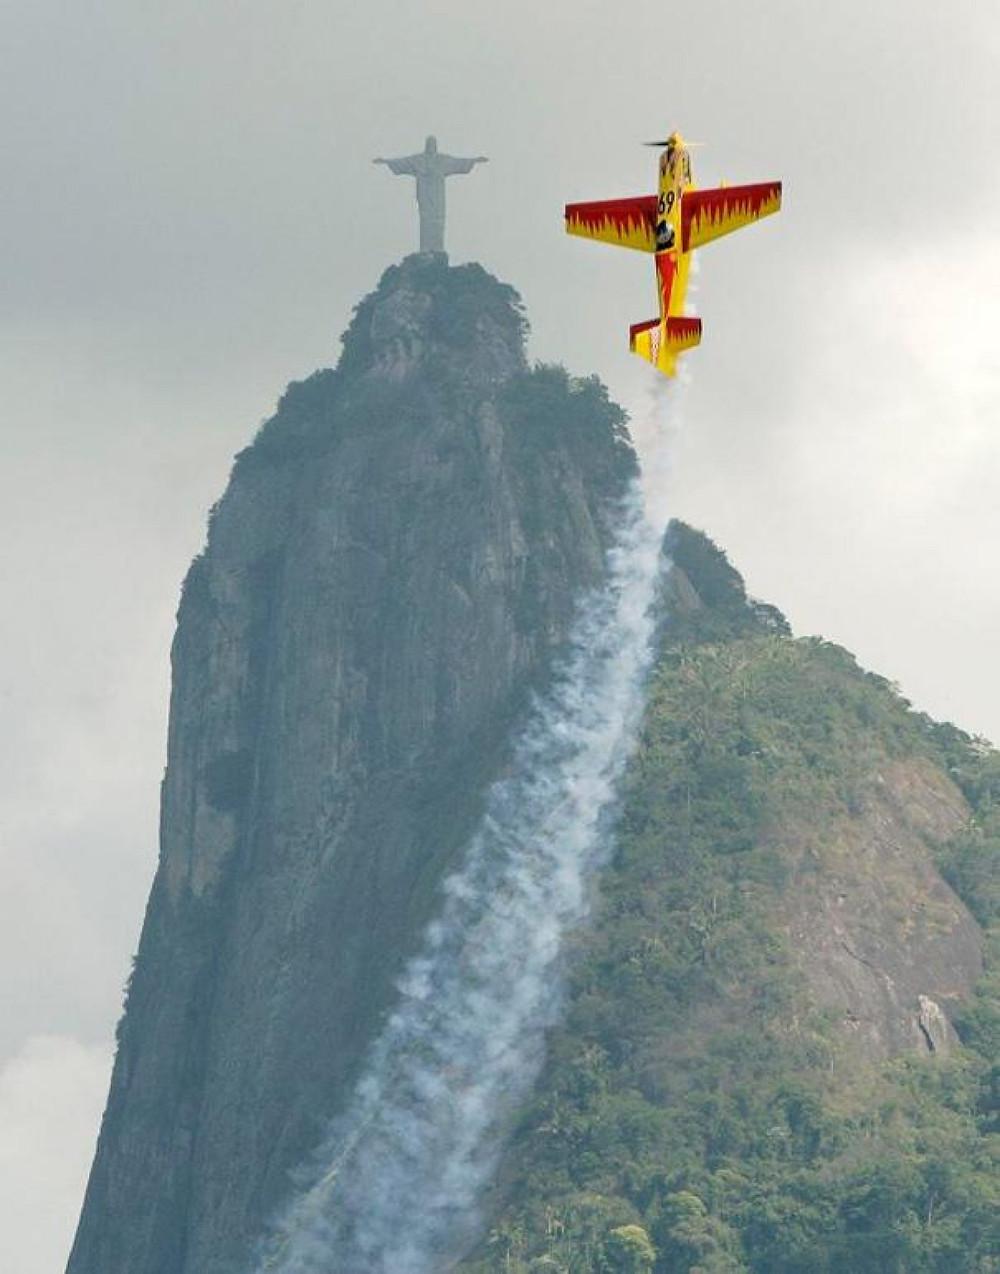 Airplane mimics a statue